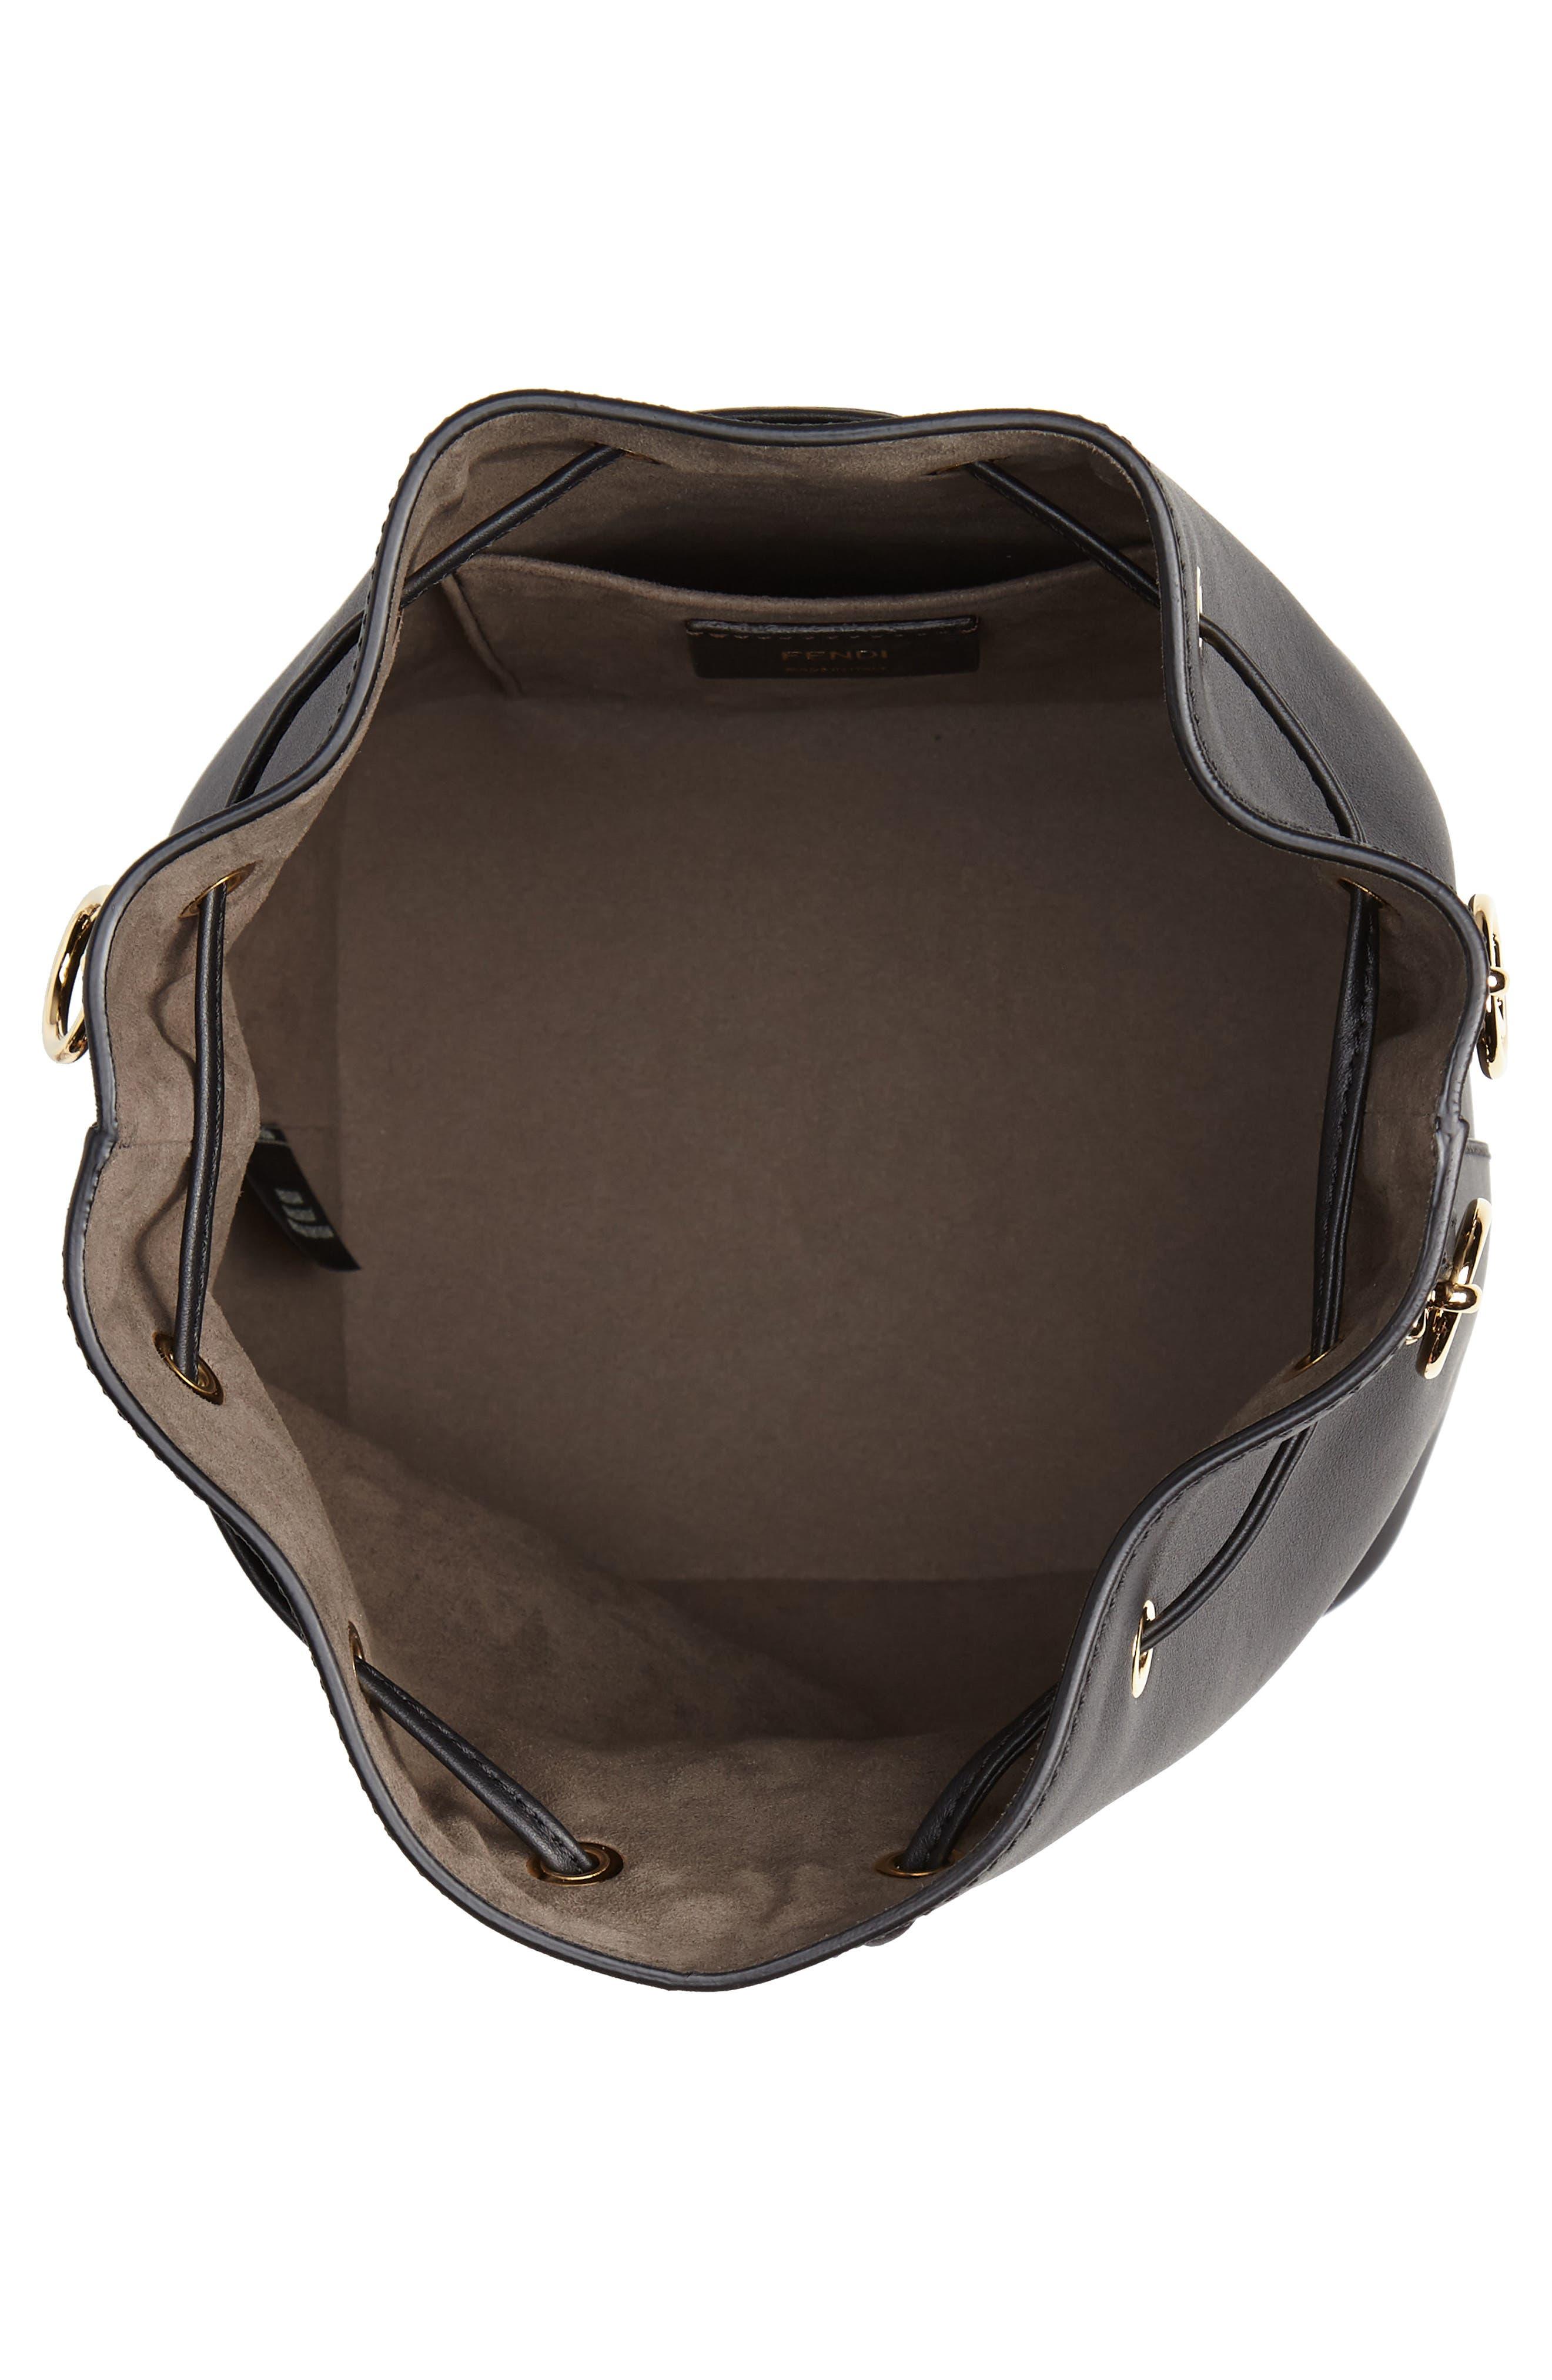 FENDI, Mon Tresor Logo Bucket Bag, Alternate thumbnail 4, color, 006